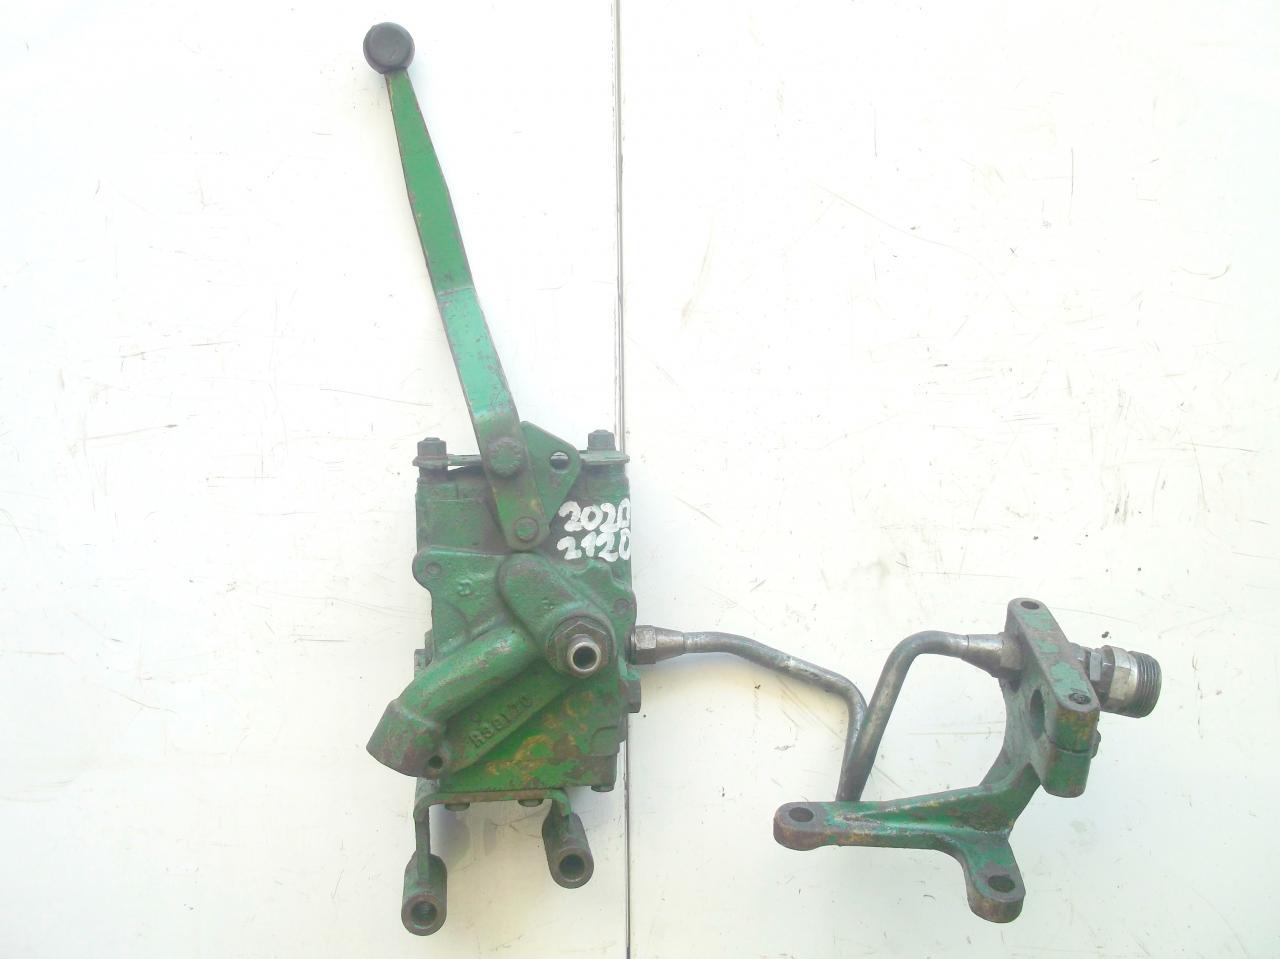 pompe hydraulique tracteur john deere 1120. Black Bedroom Furniture Sets. Home Design Ideas